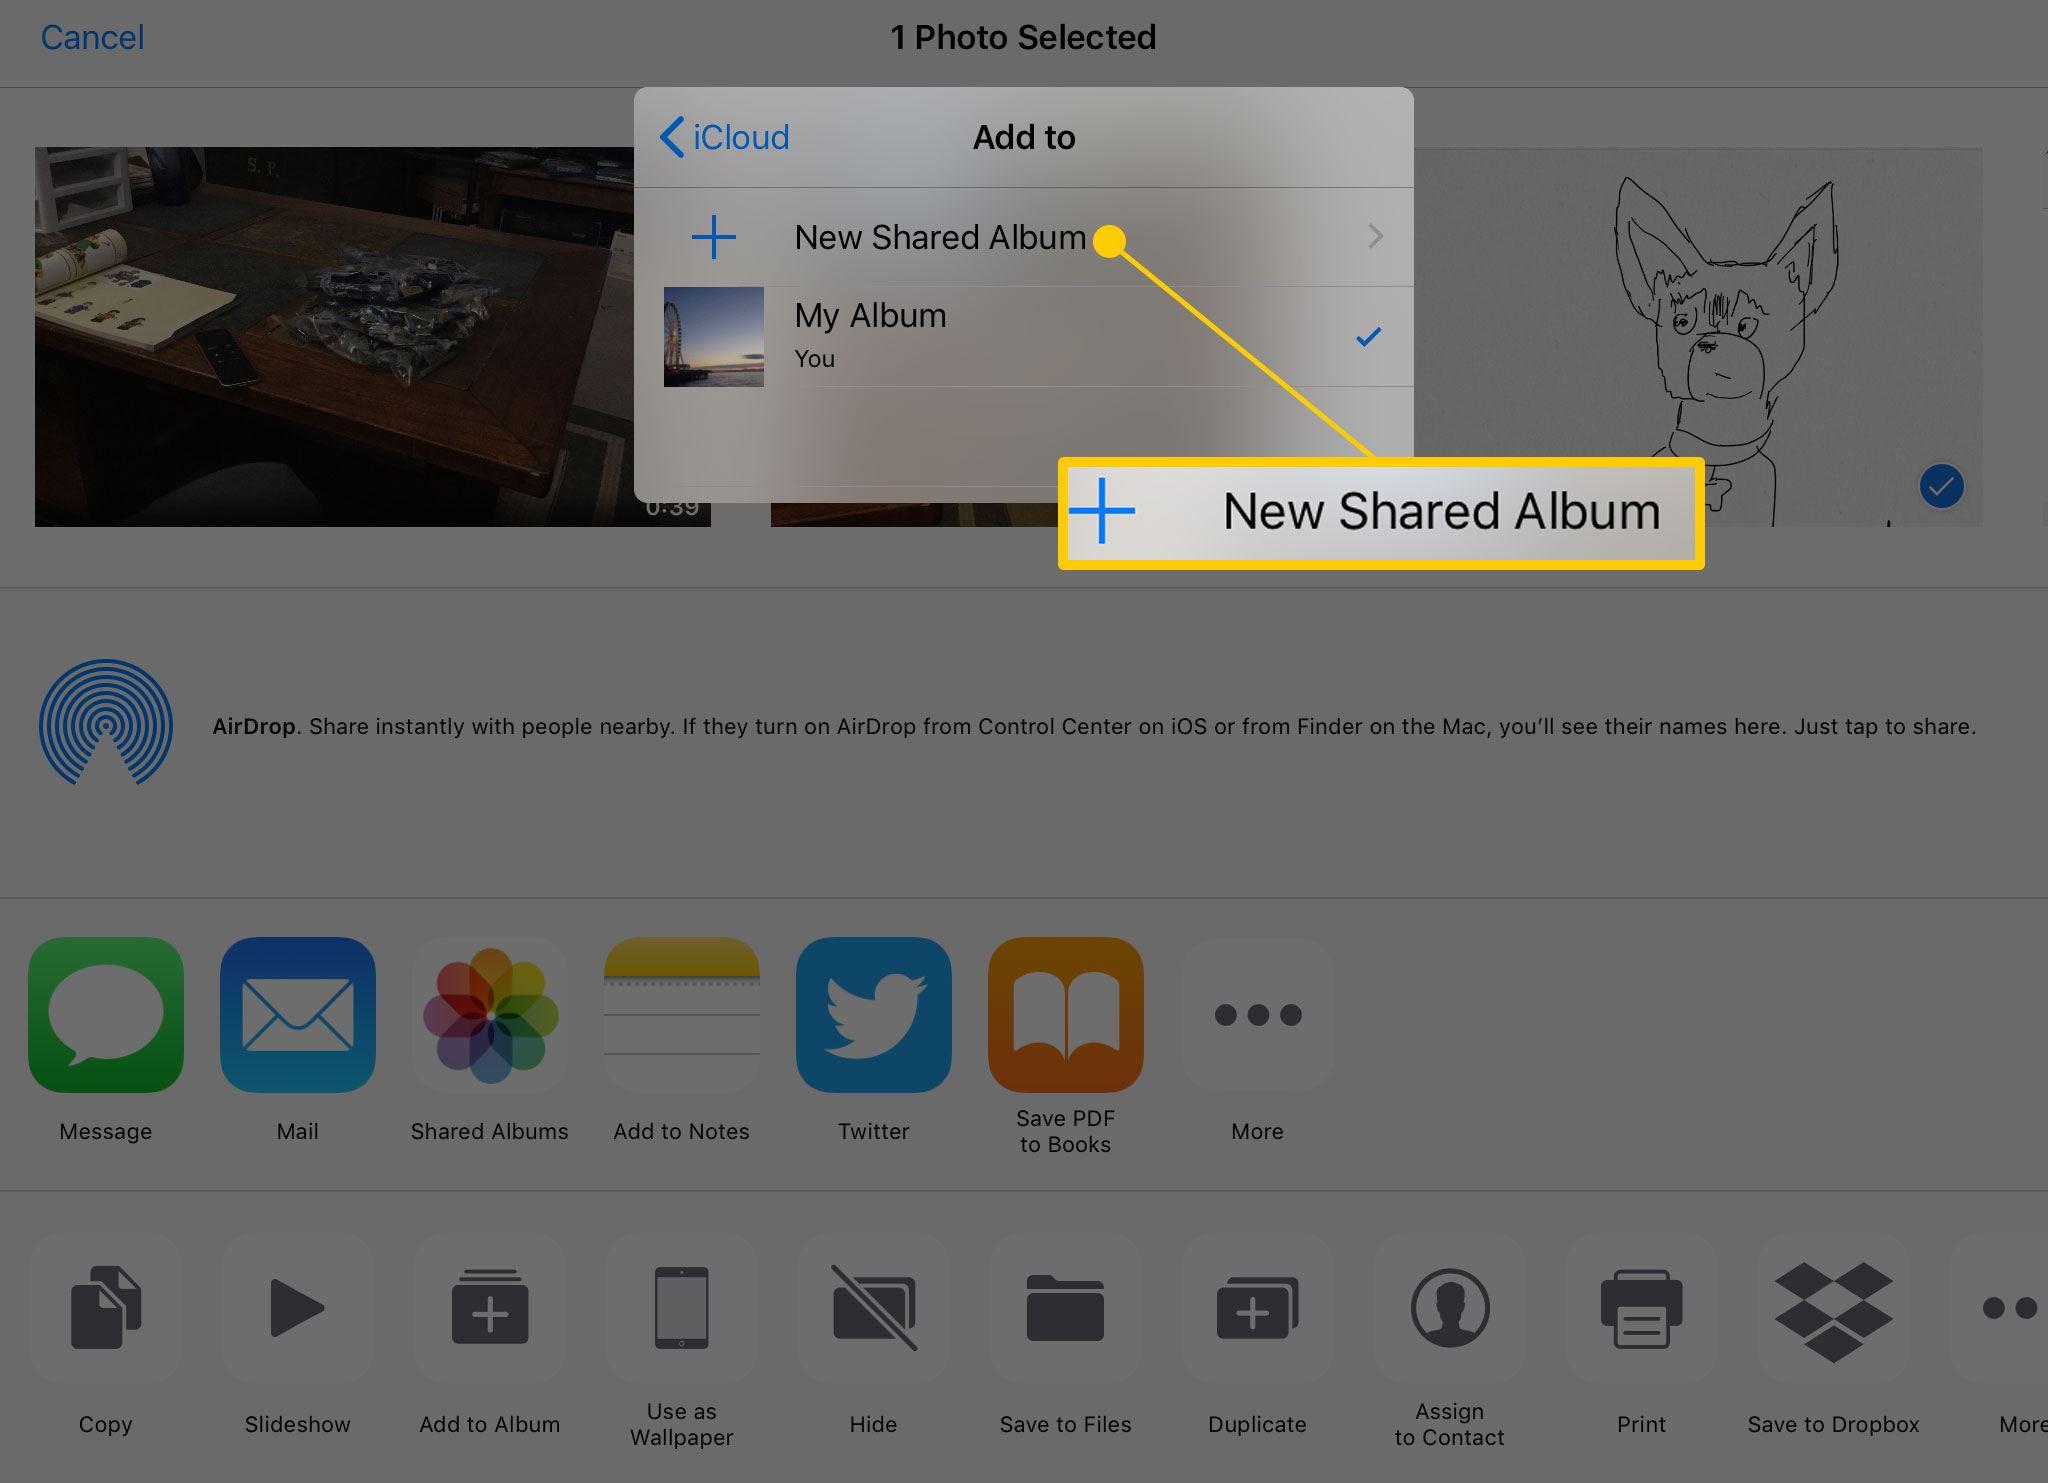 Creating a new shared album on iPad